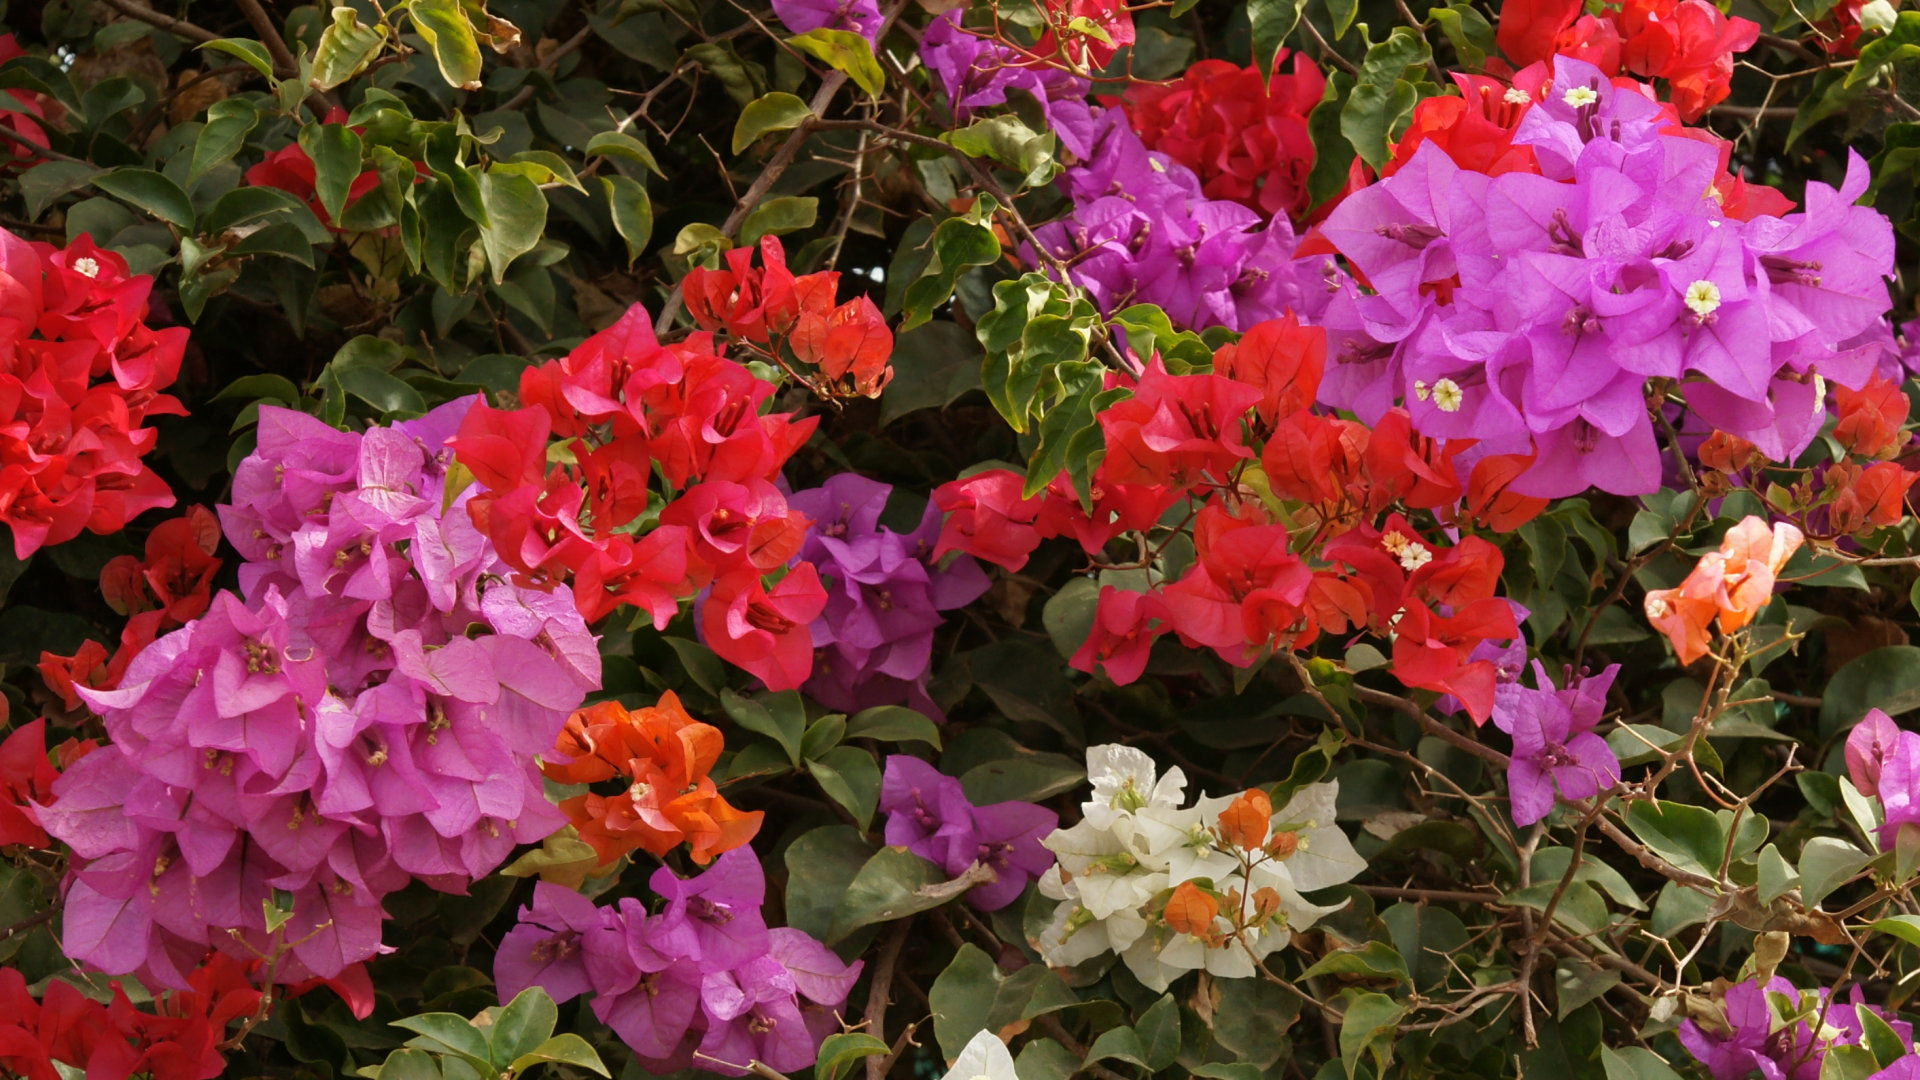 fond d'ecran gratuit geranium